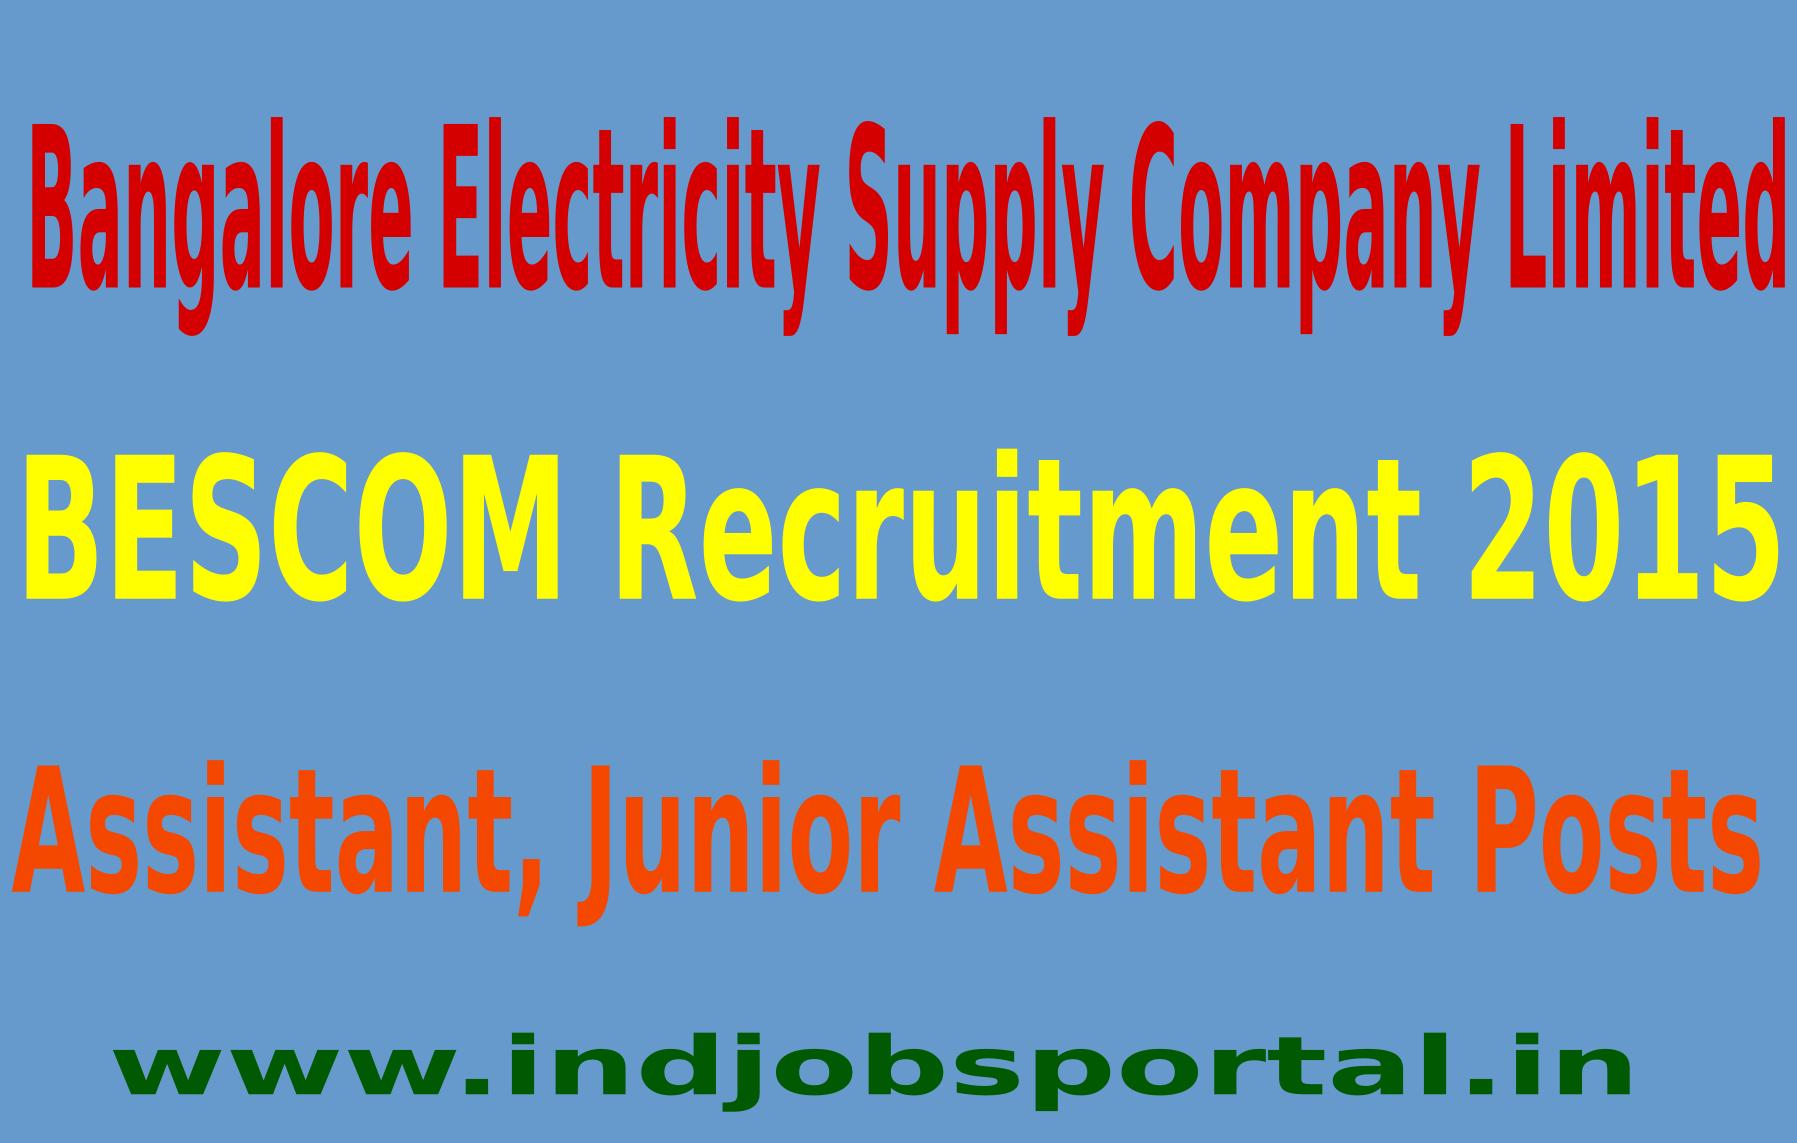 BESCOM Recruitment 2015 Online Application For 466 Assistant, Junior Assistant Posts